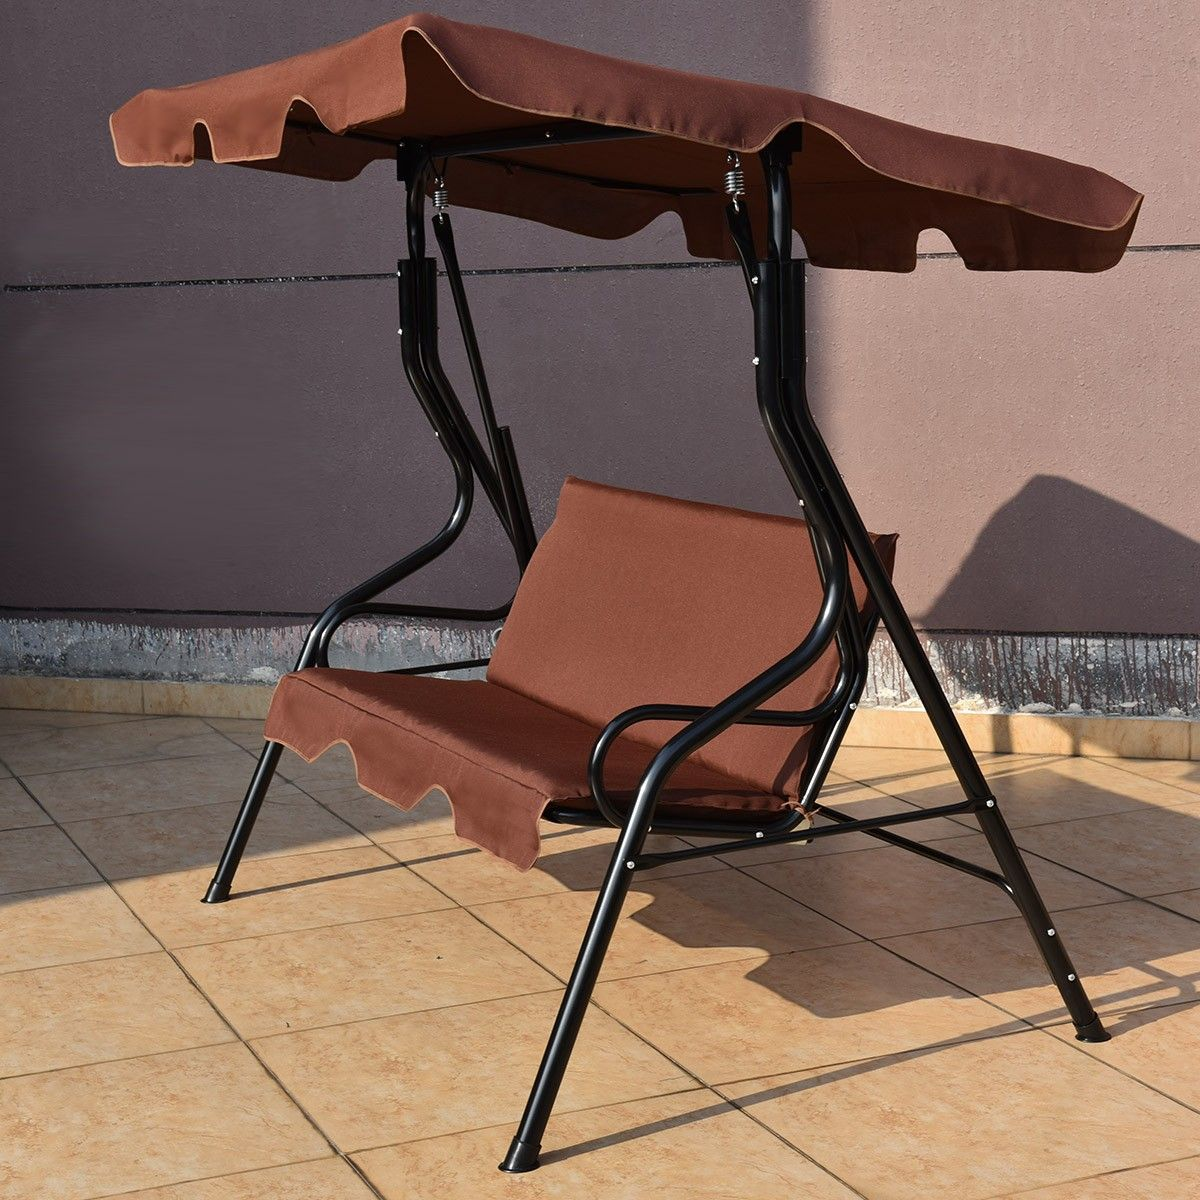 Costway Seats Patio Canopy Swing This elegant threeseat patio swing